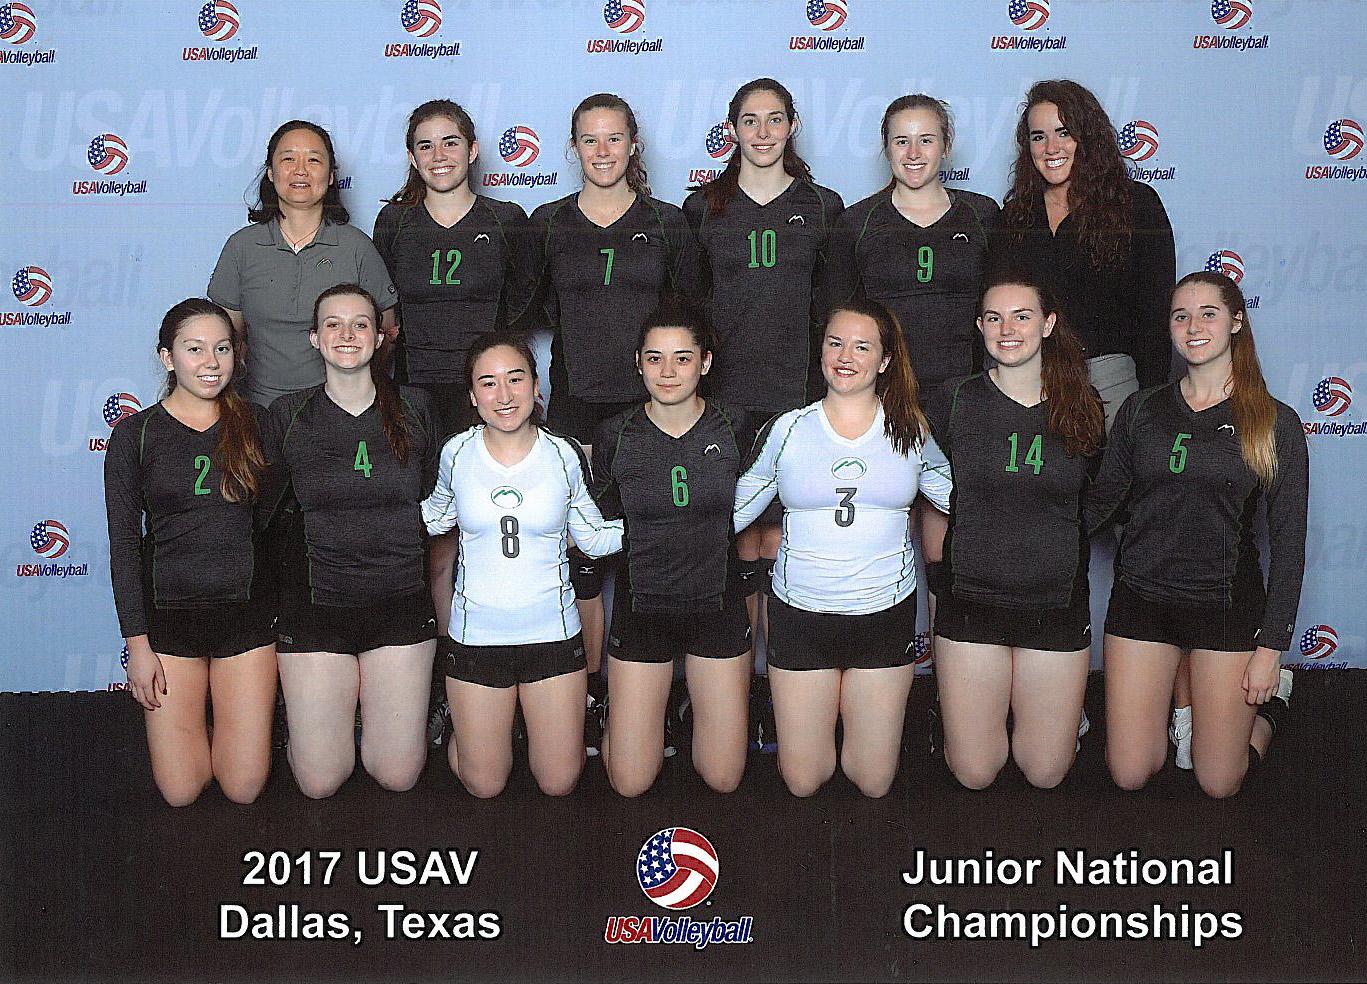 18 Black- Junior National Championships - USA Division